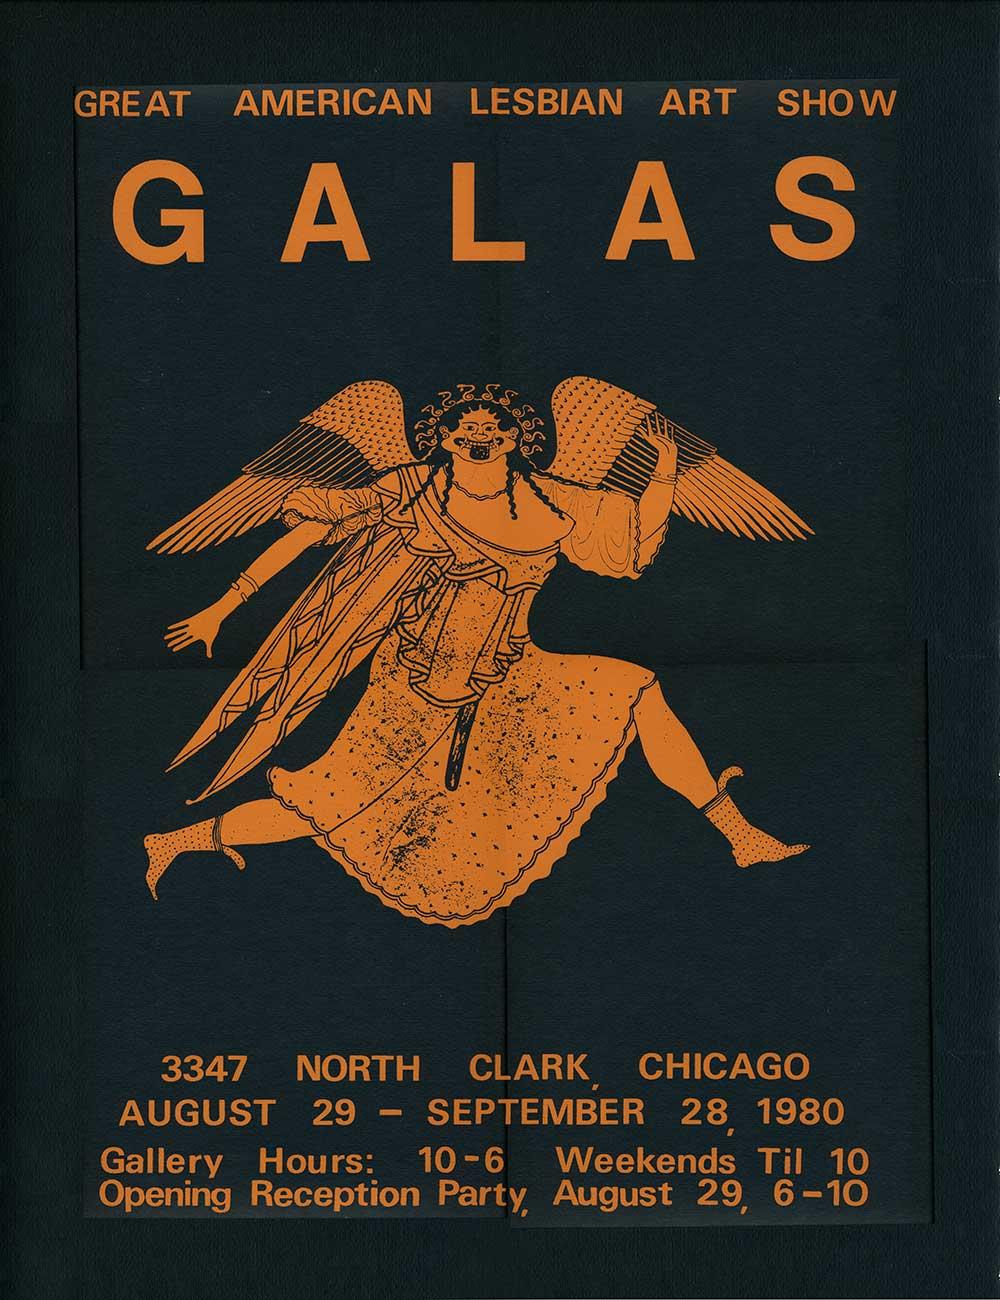 Galas: Great American Lesbian Art Show